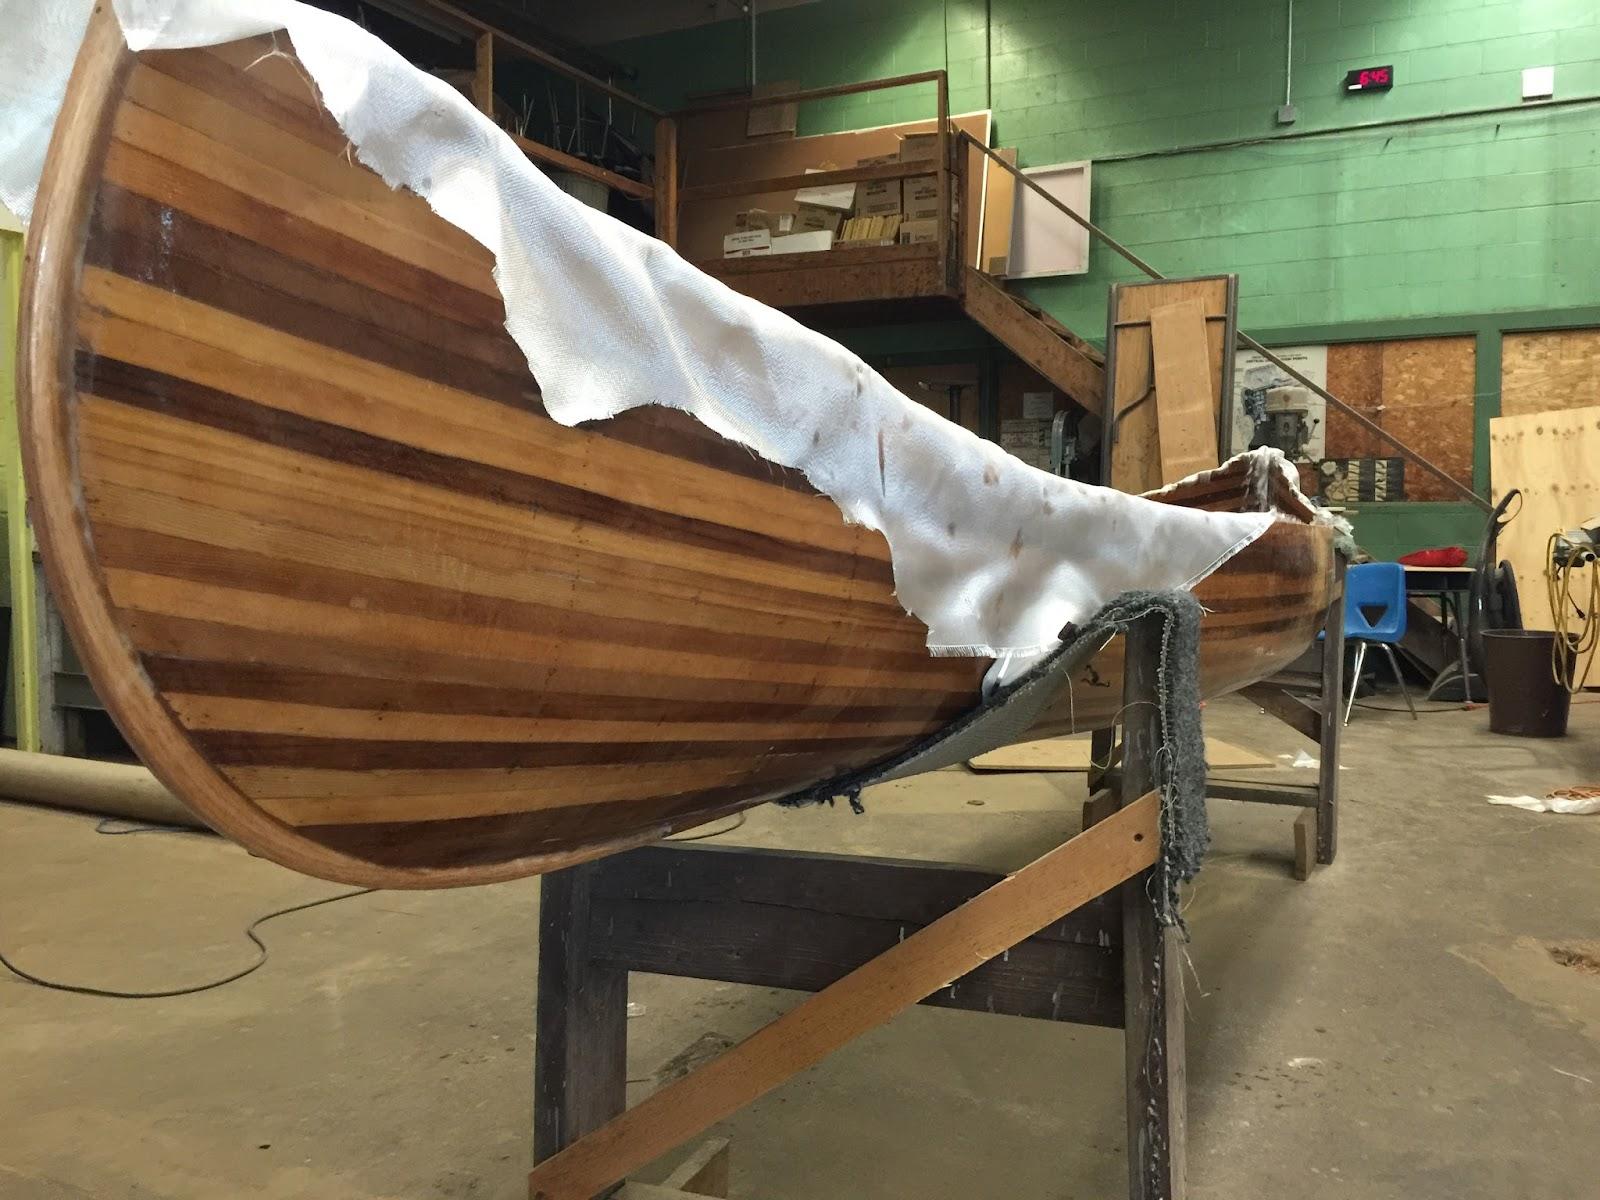 Canoe 5-18 1